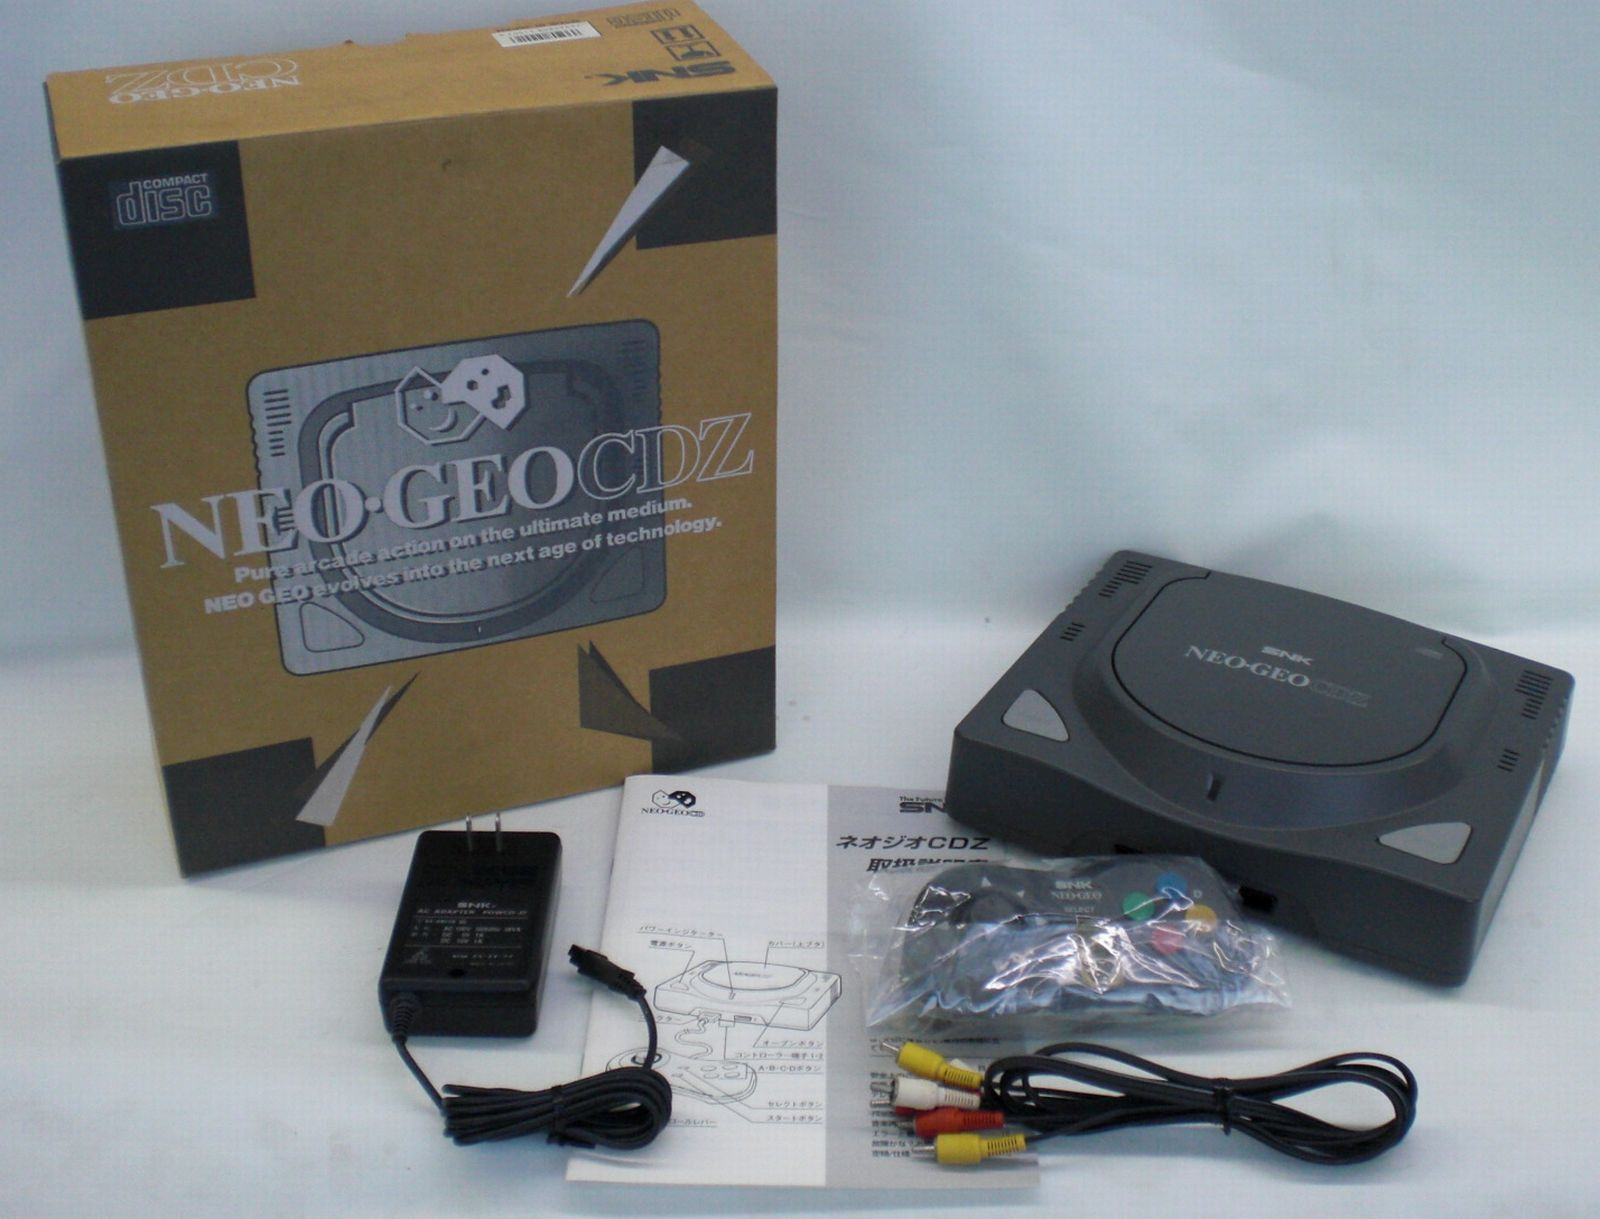 SNK ネオジオ CDZ (CD-T02)